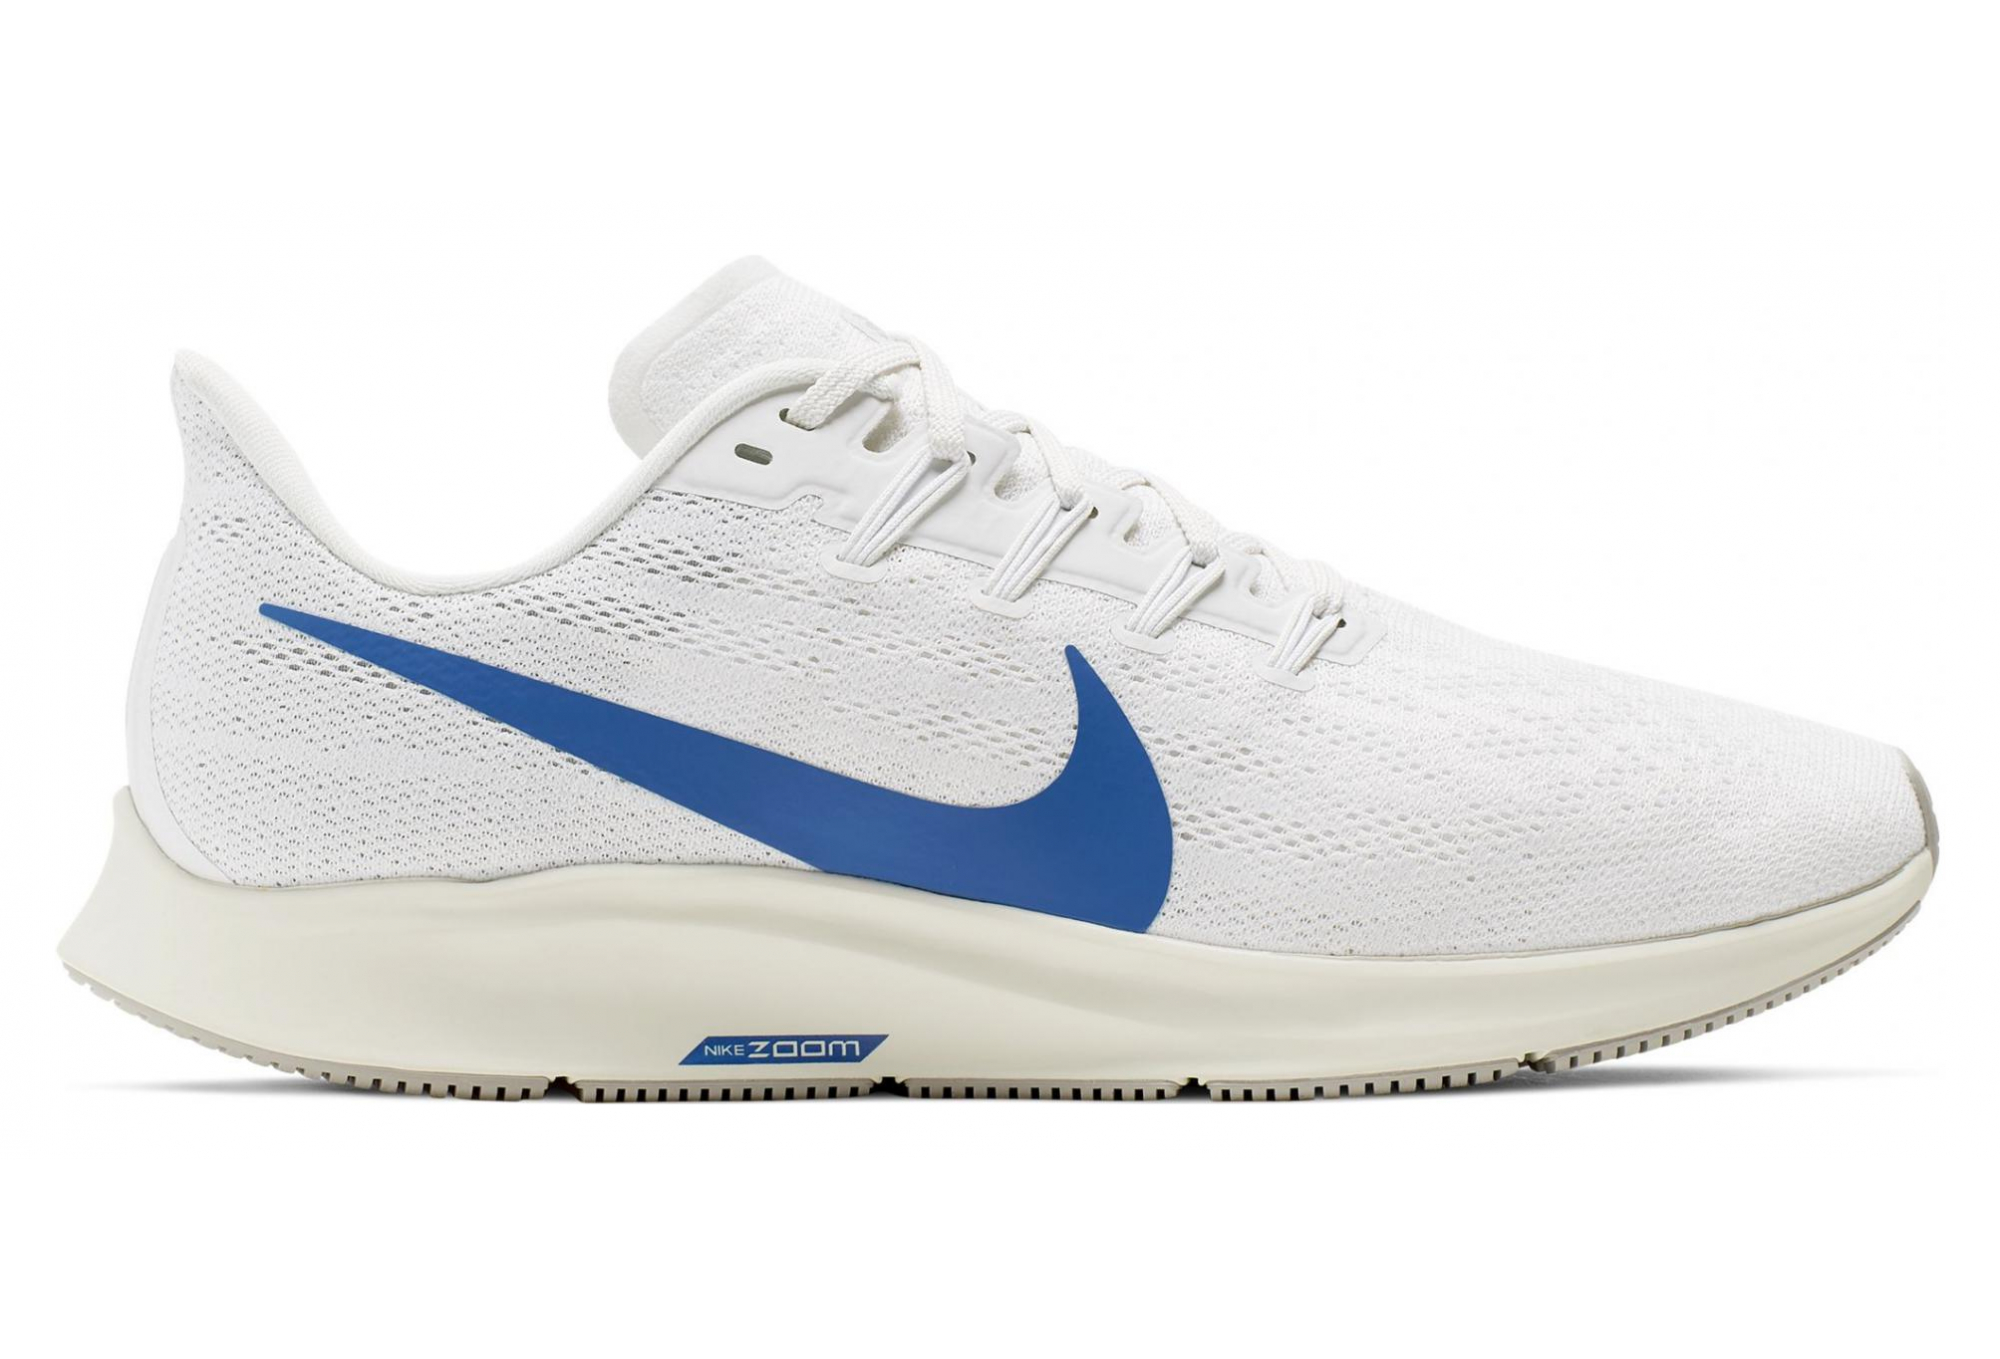 Baskets Running Air Zoom Pegasus 33 Nike Mens Sale 36 Blue